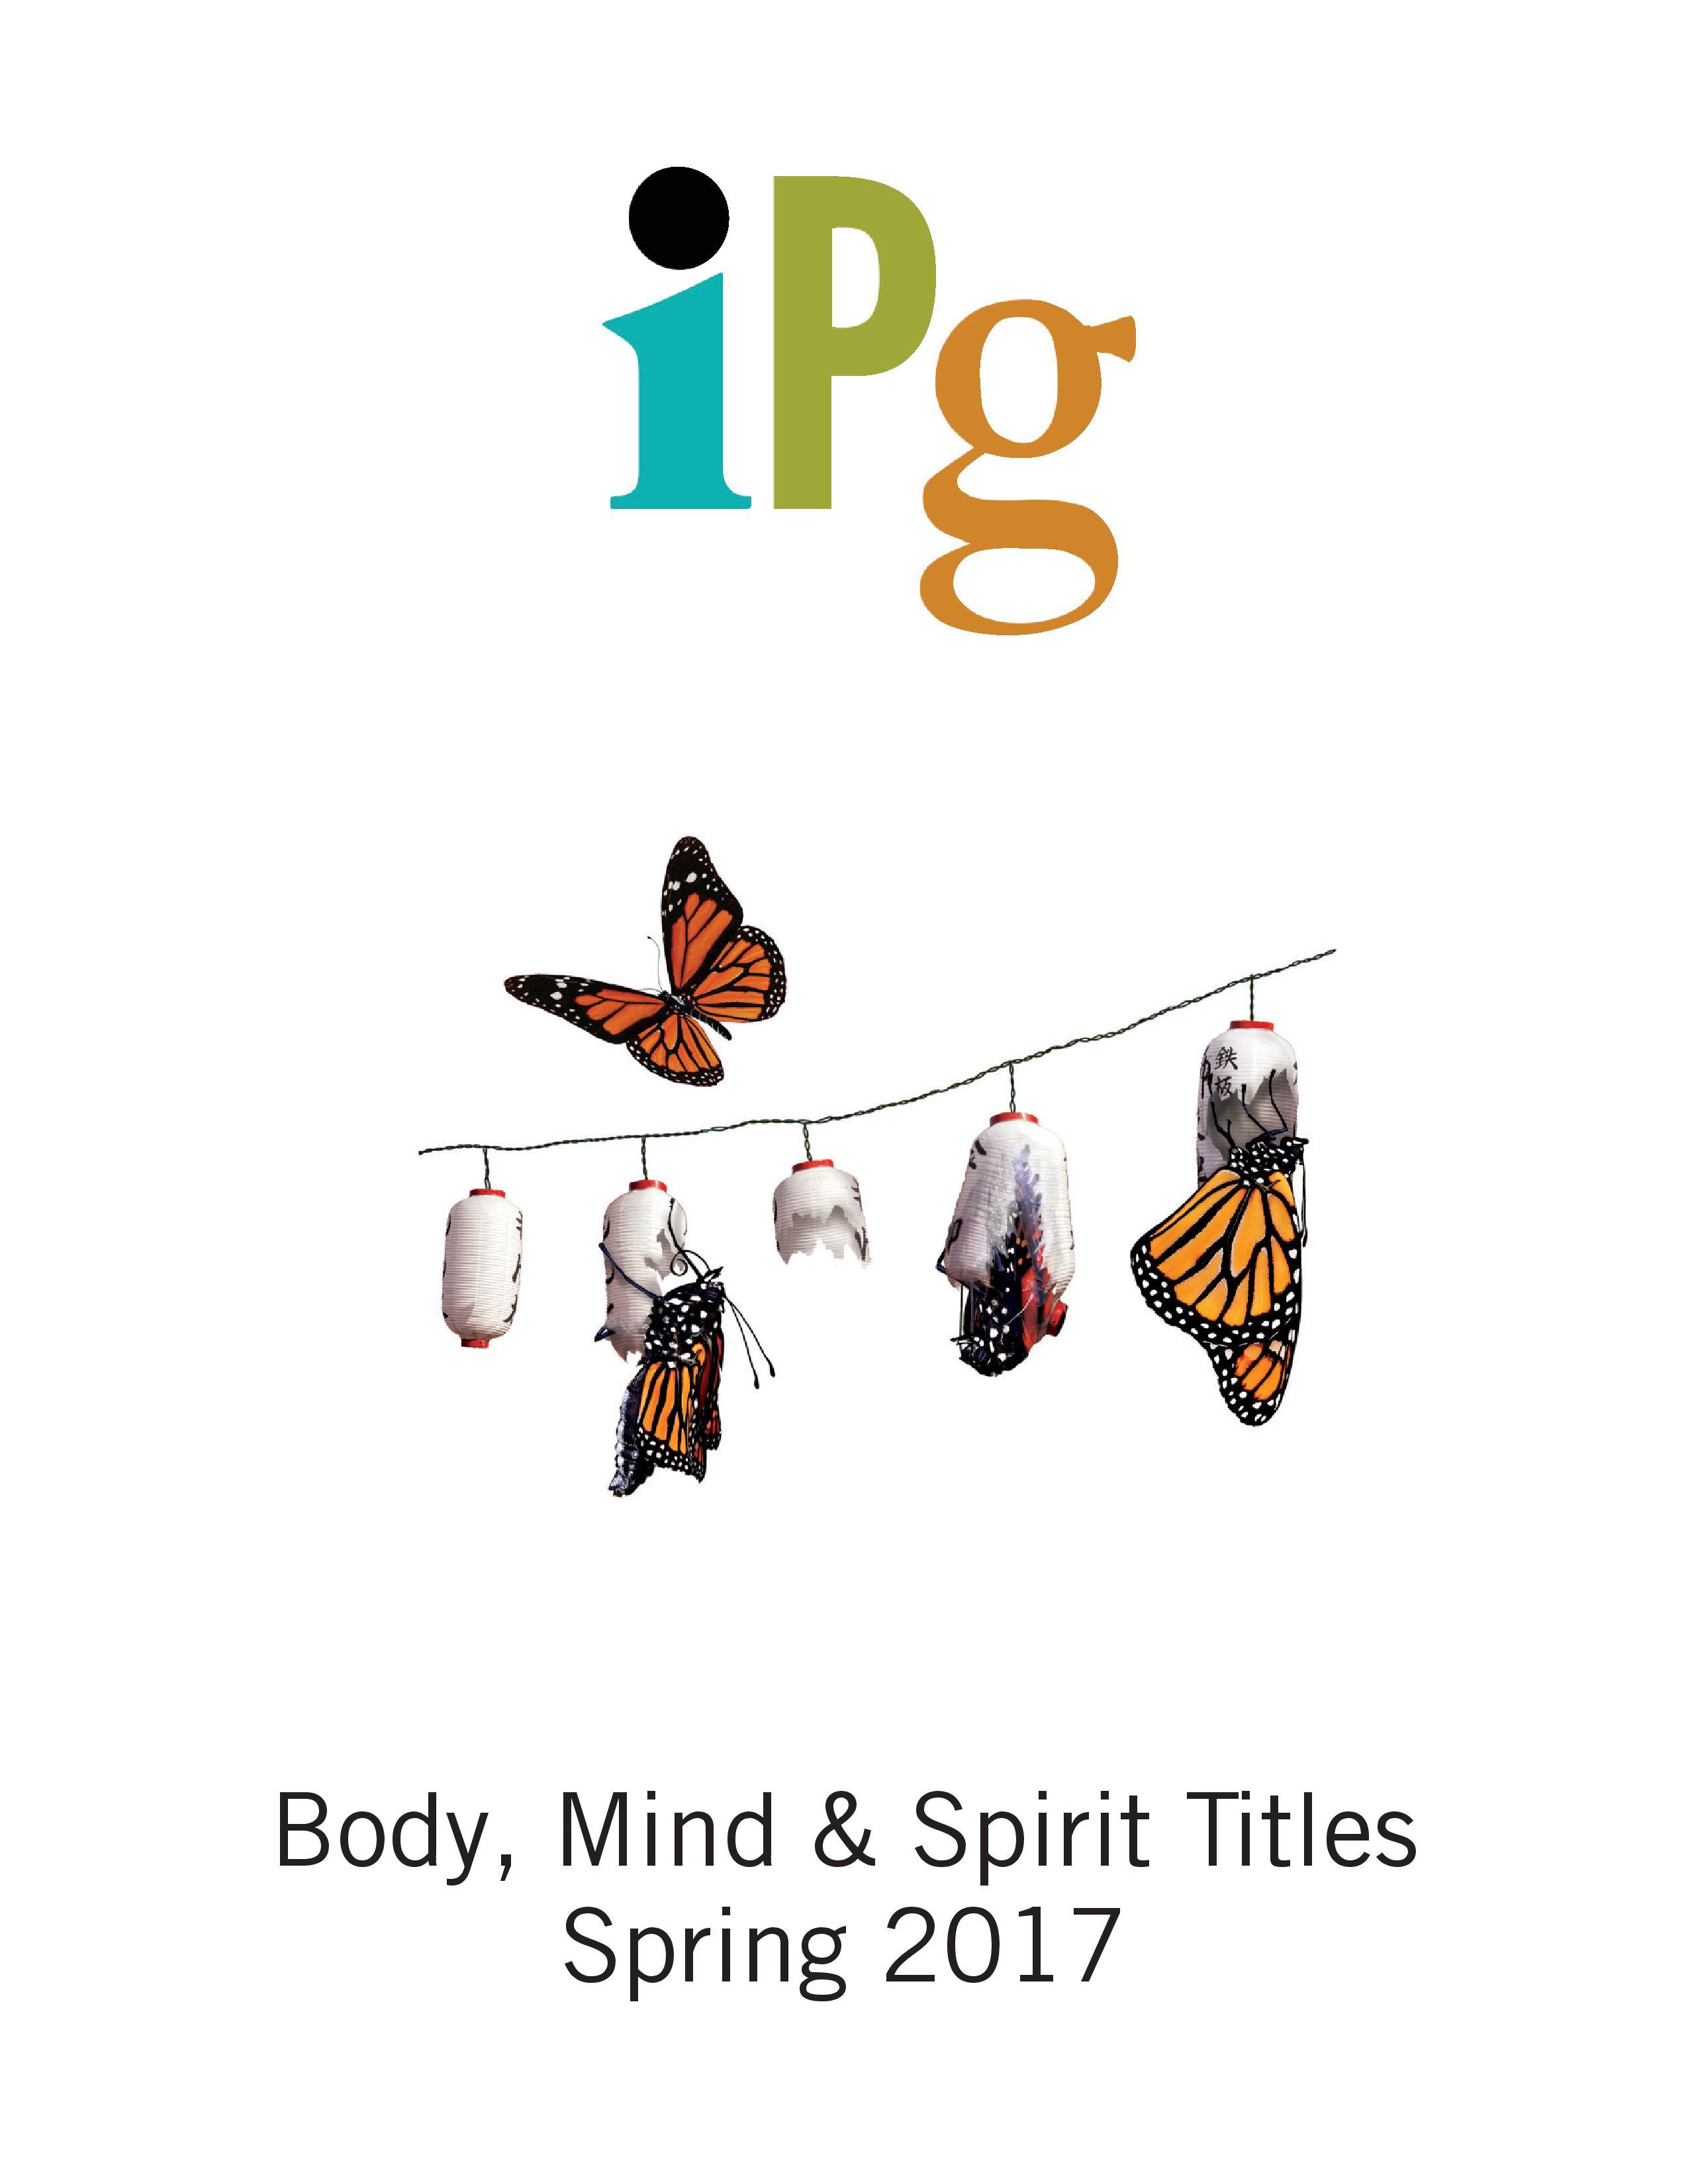 Body, Mind, & Spirit Titles